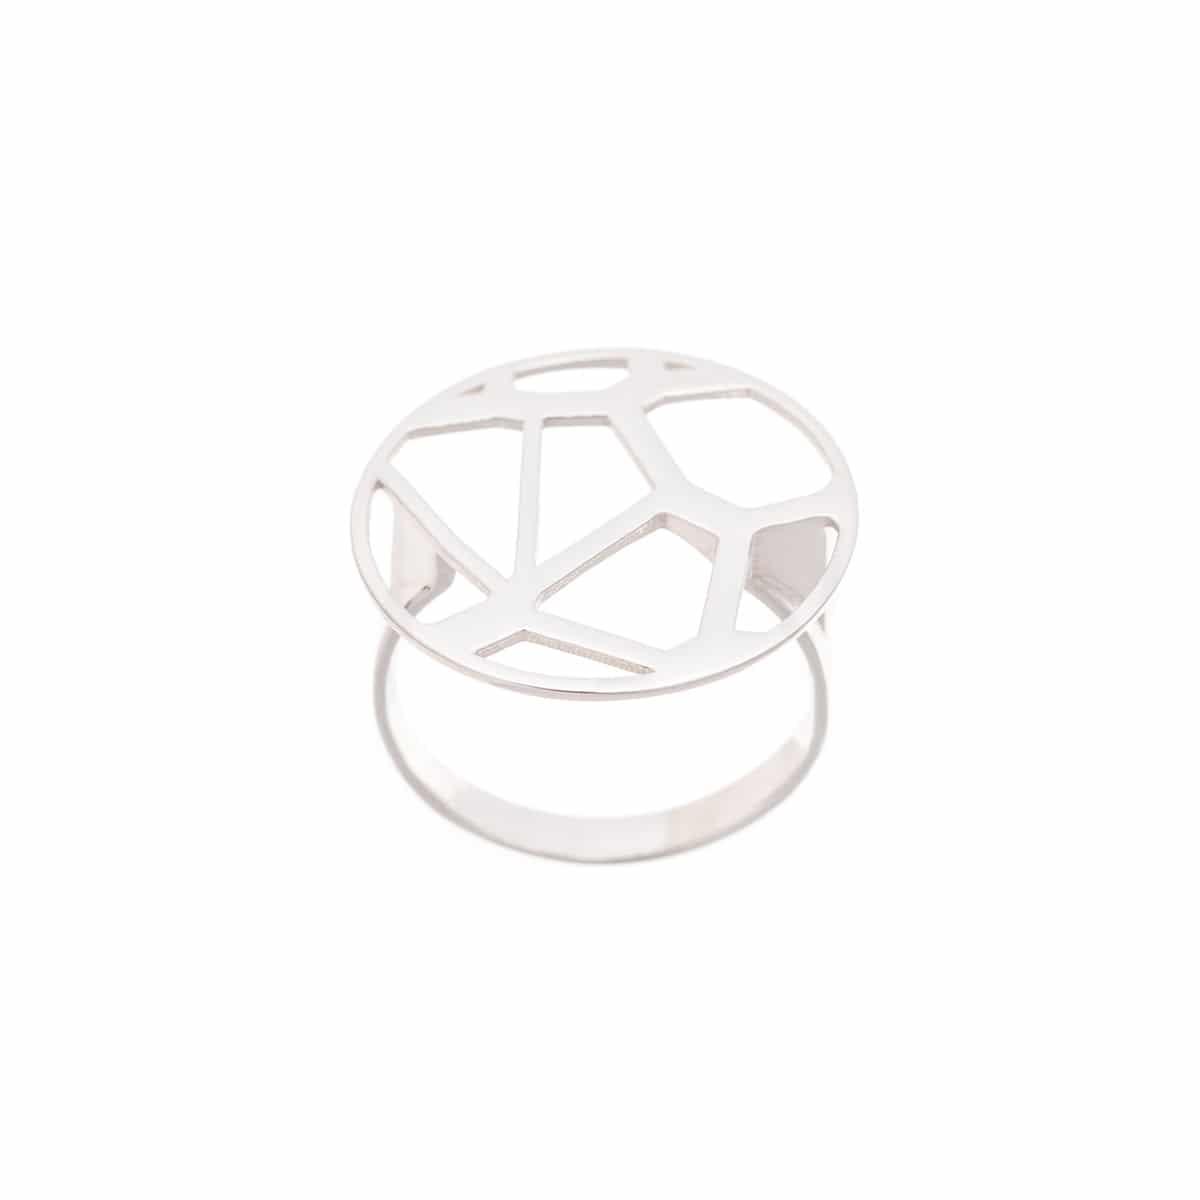 9-Vornoi-ring-silver-1200px